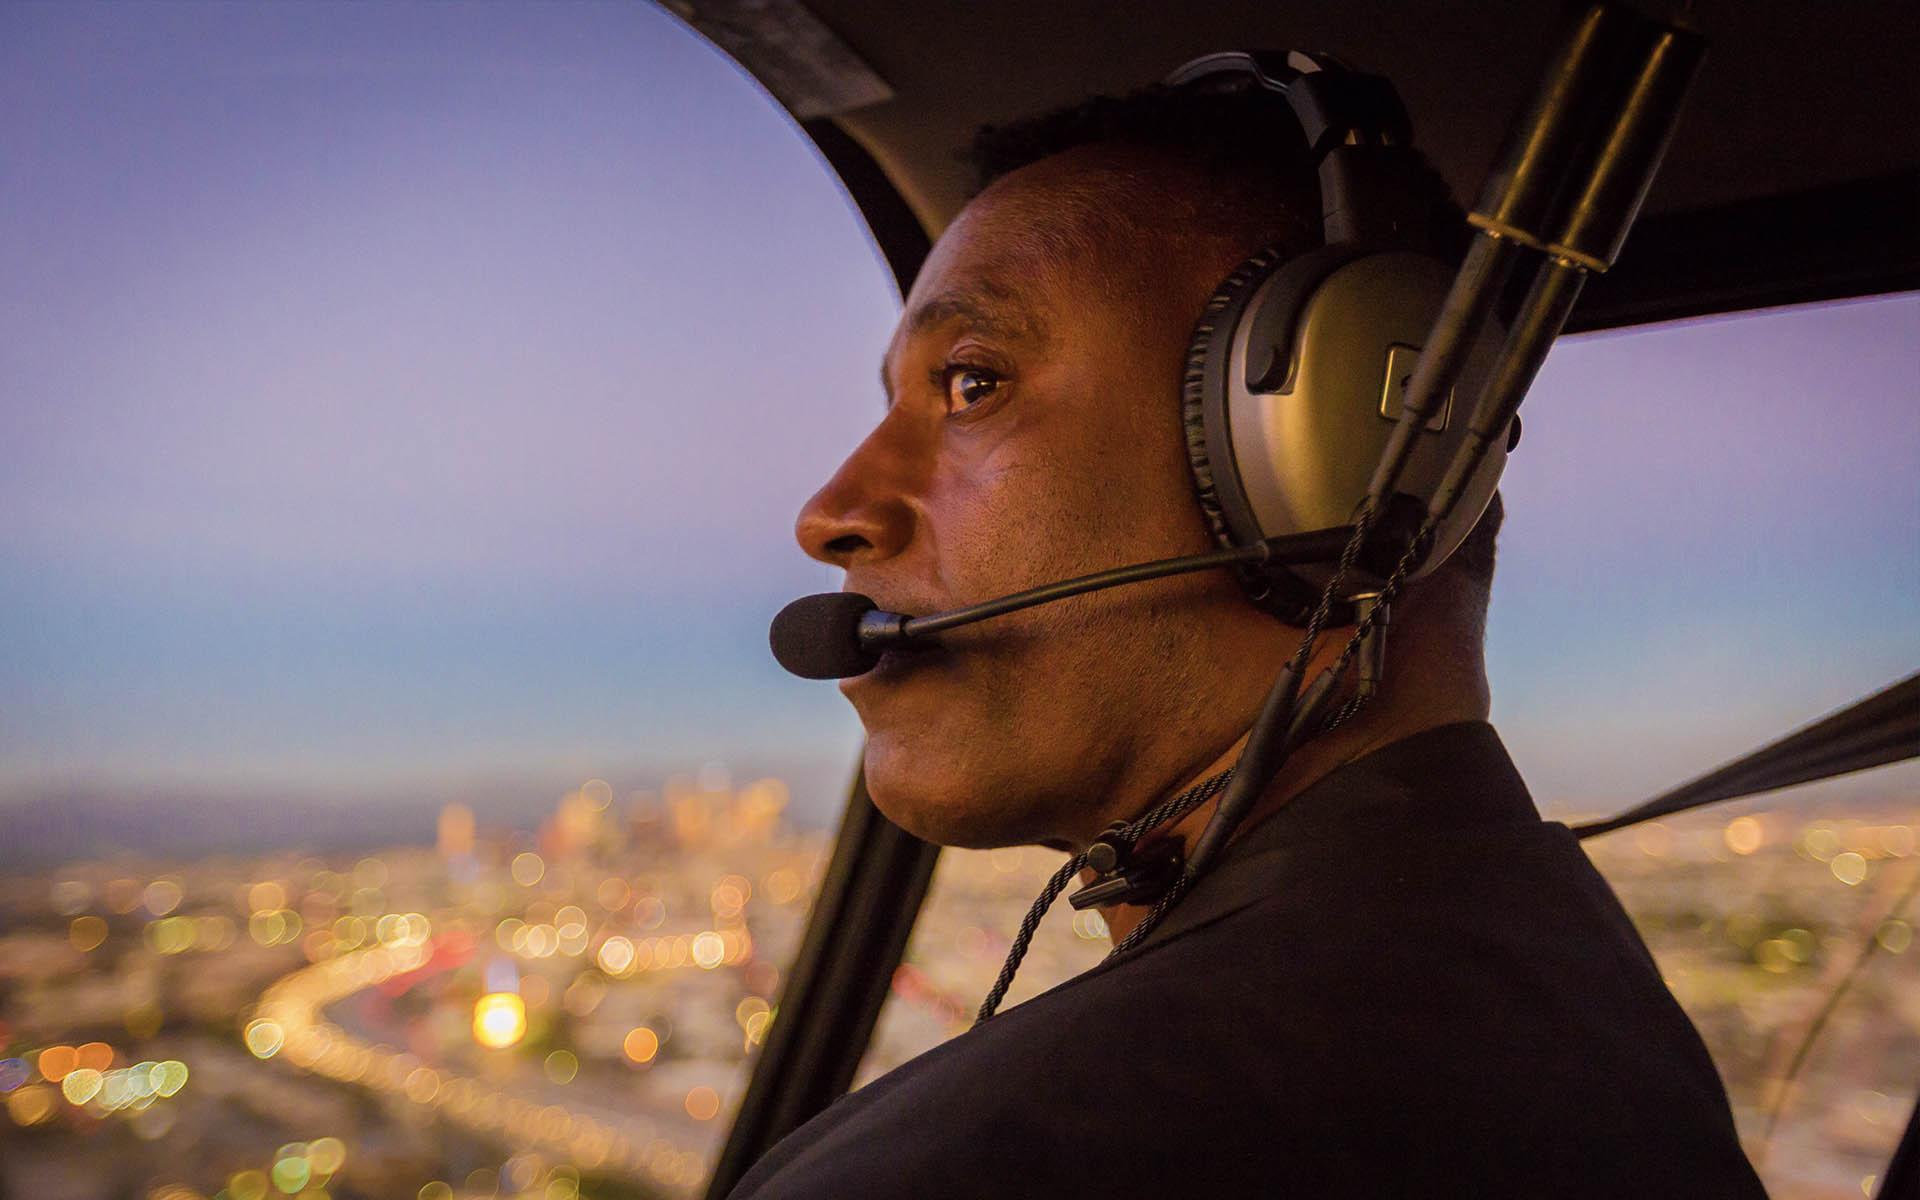 Chief Pilot Robin Petgrave